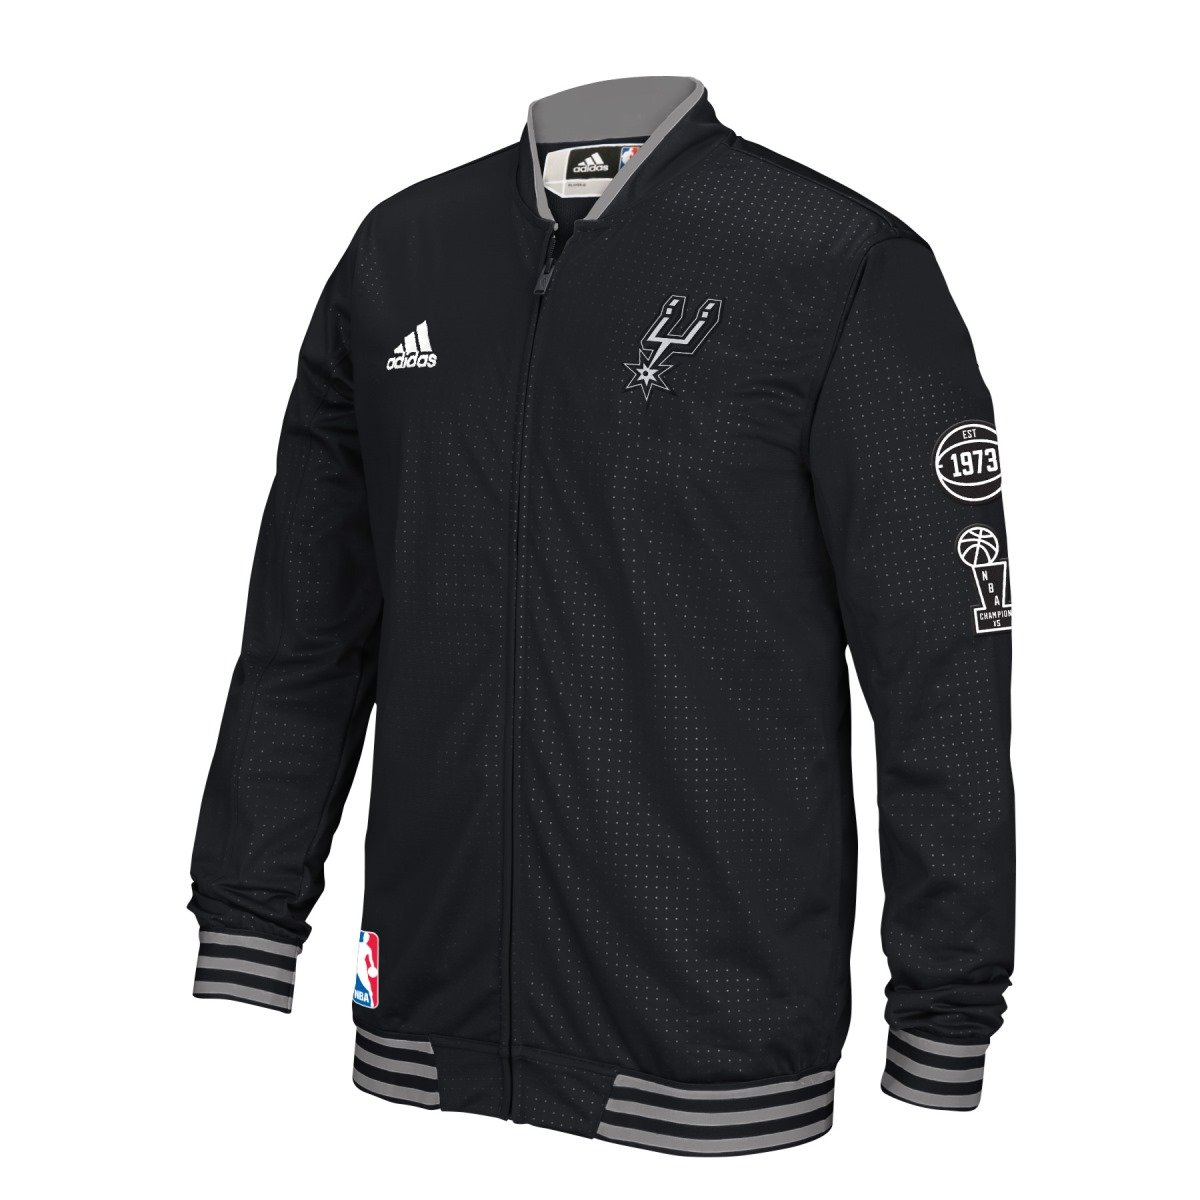 11d24819b Amazon.com   San Antonio Spurs Adidas 2015 NBA Men s On-Court Warm-Up Full  Zip Jacket   Sports   Outdoors